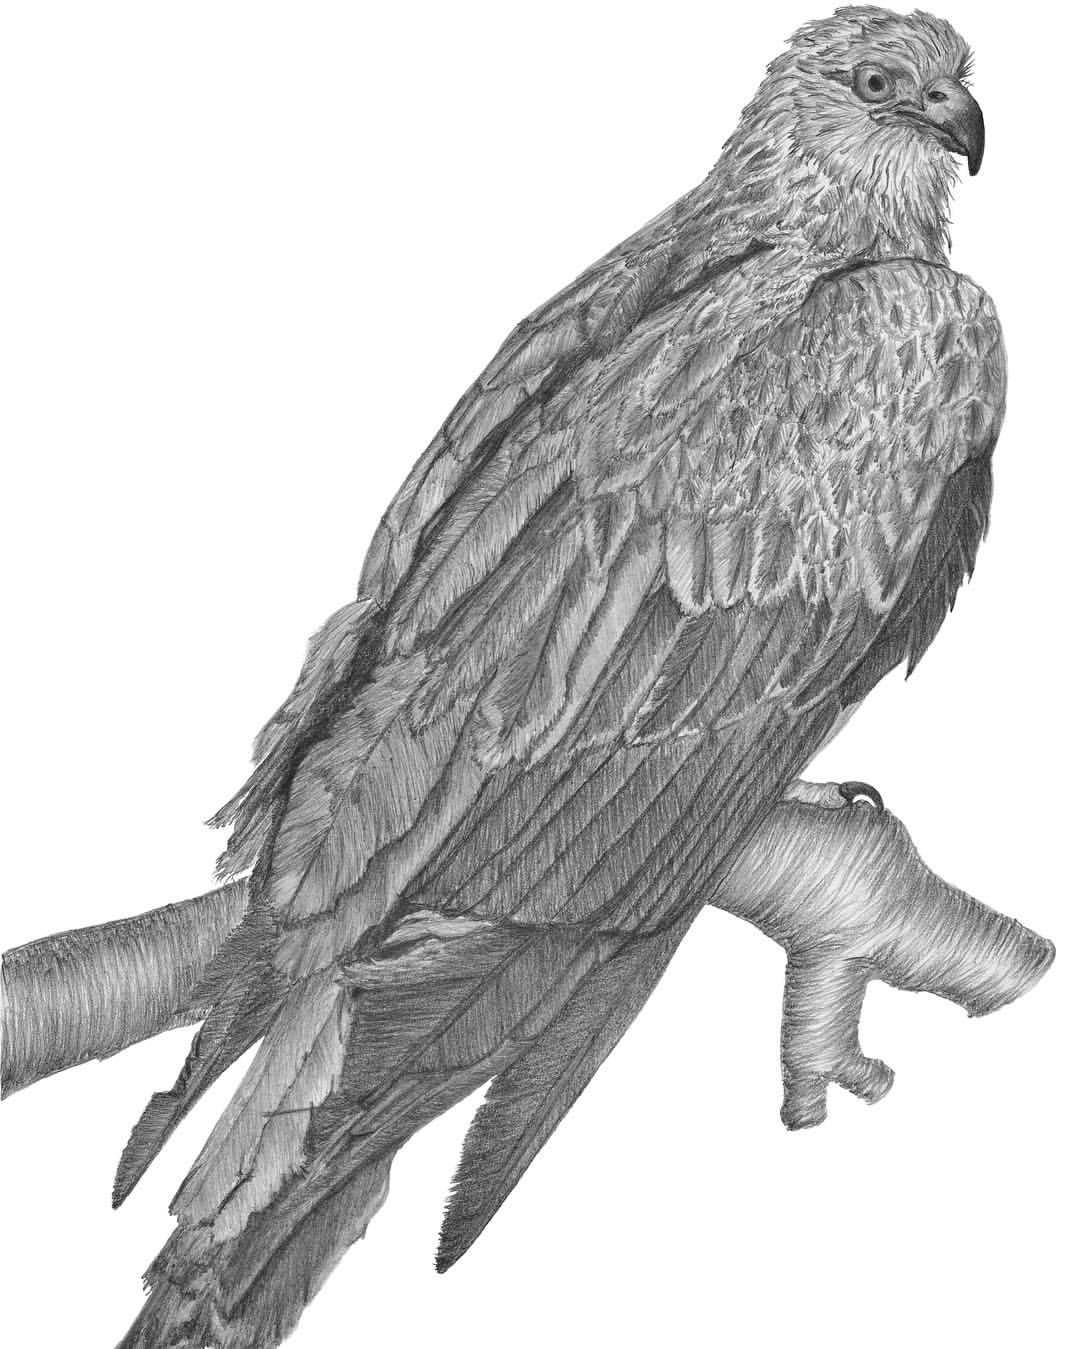 Red Kite. #graphitepencil #naturedrawing #art #pencildrawing #drawing #bird #red-kite # ...